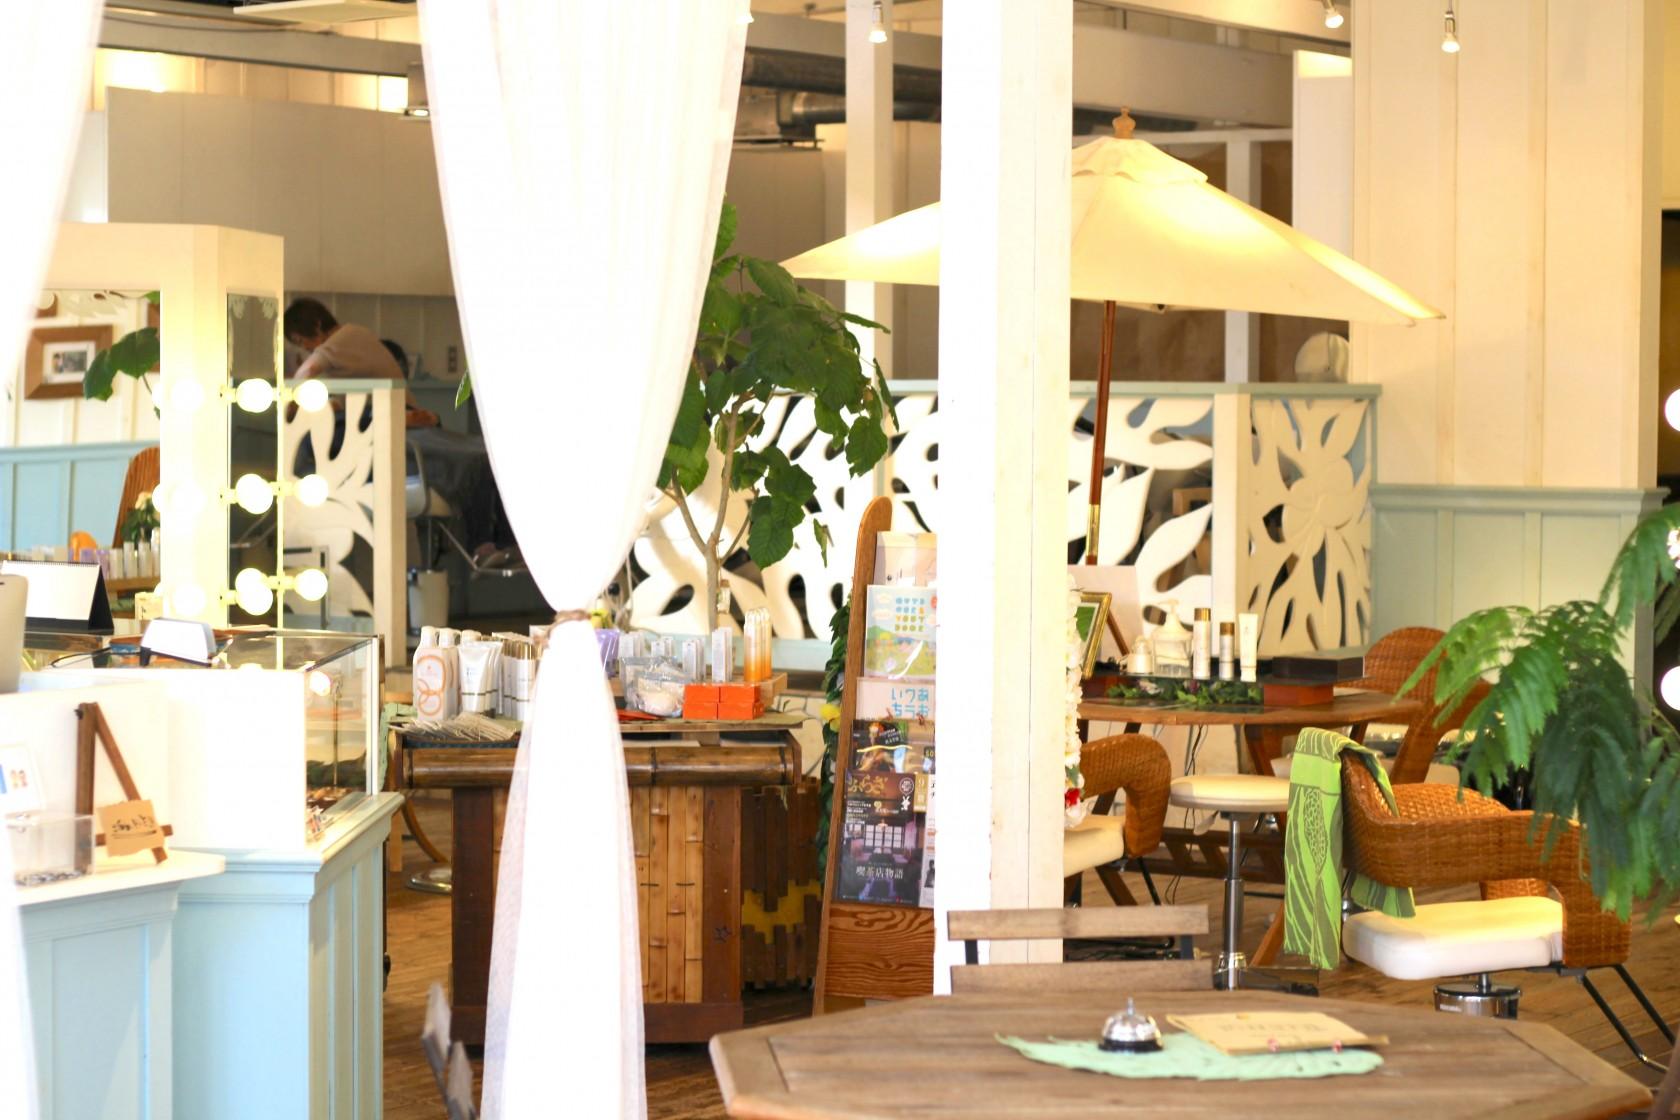 MAHALOCO 水戸:ハワイのような空間の室内